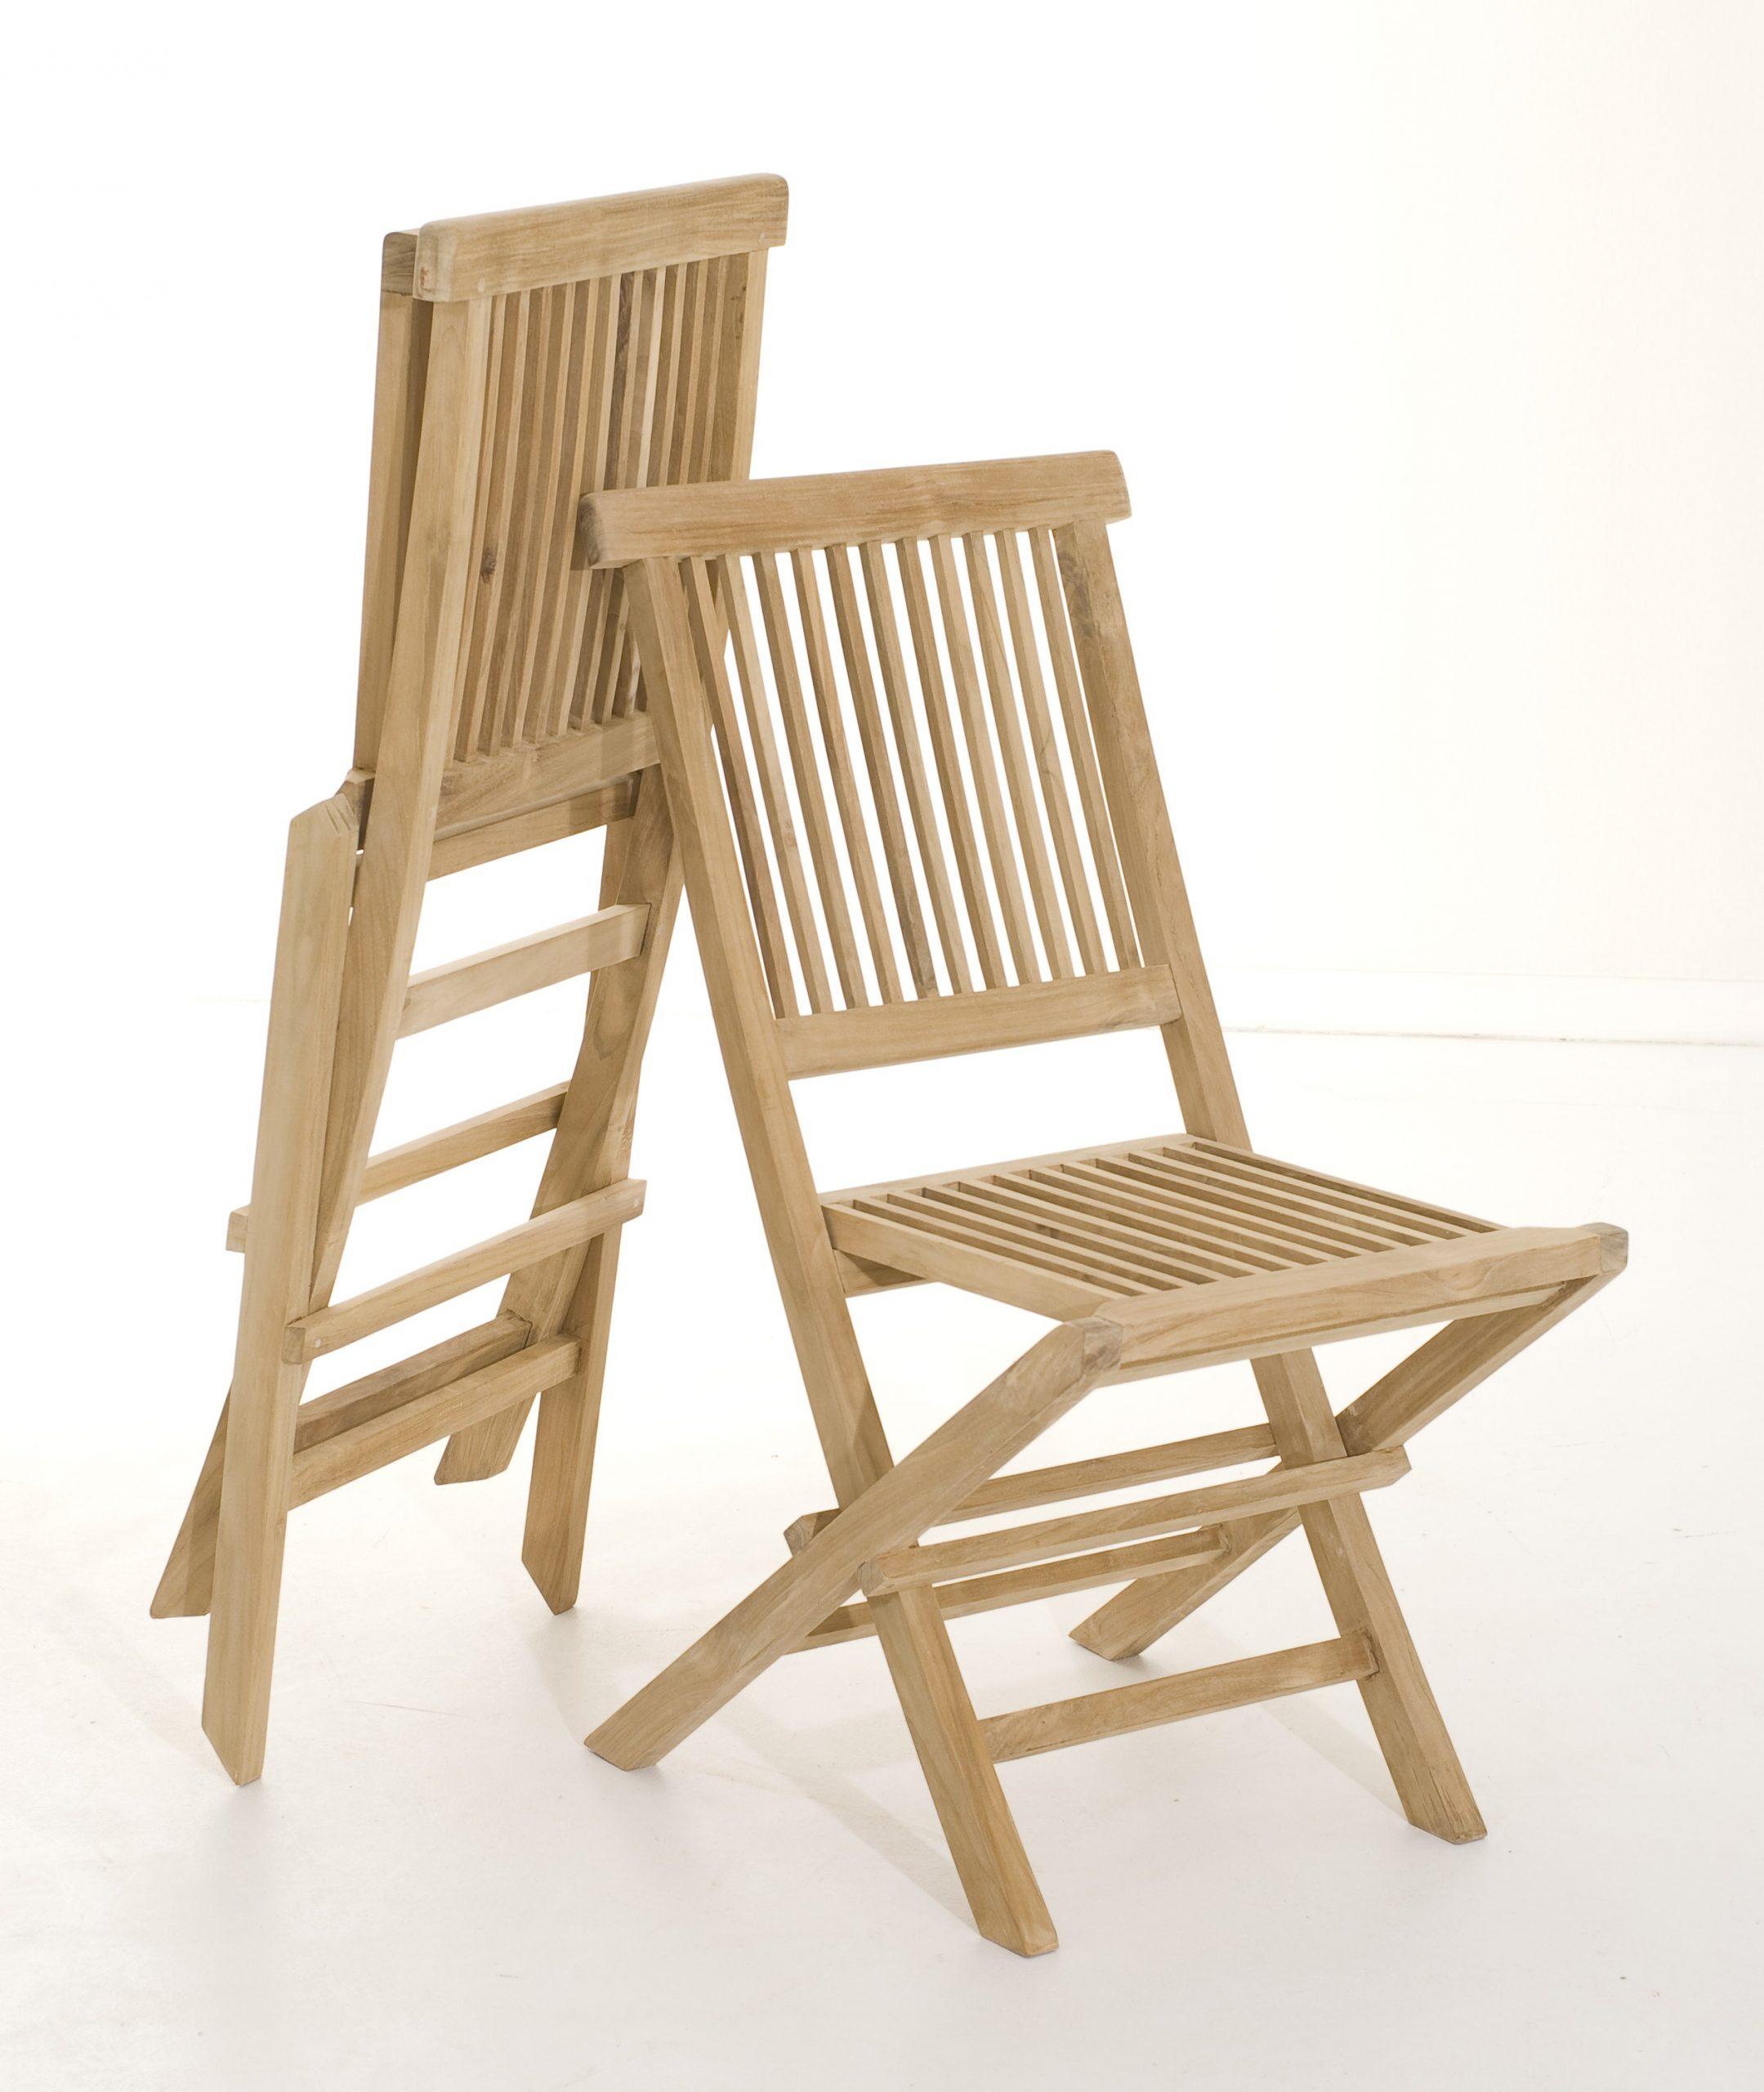 Lot De 2 Chaises De Jardin Pliante Java En Teck 90 Cm Summer avec Chaise De Jardin Pliante Pas Cher